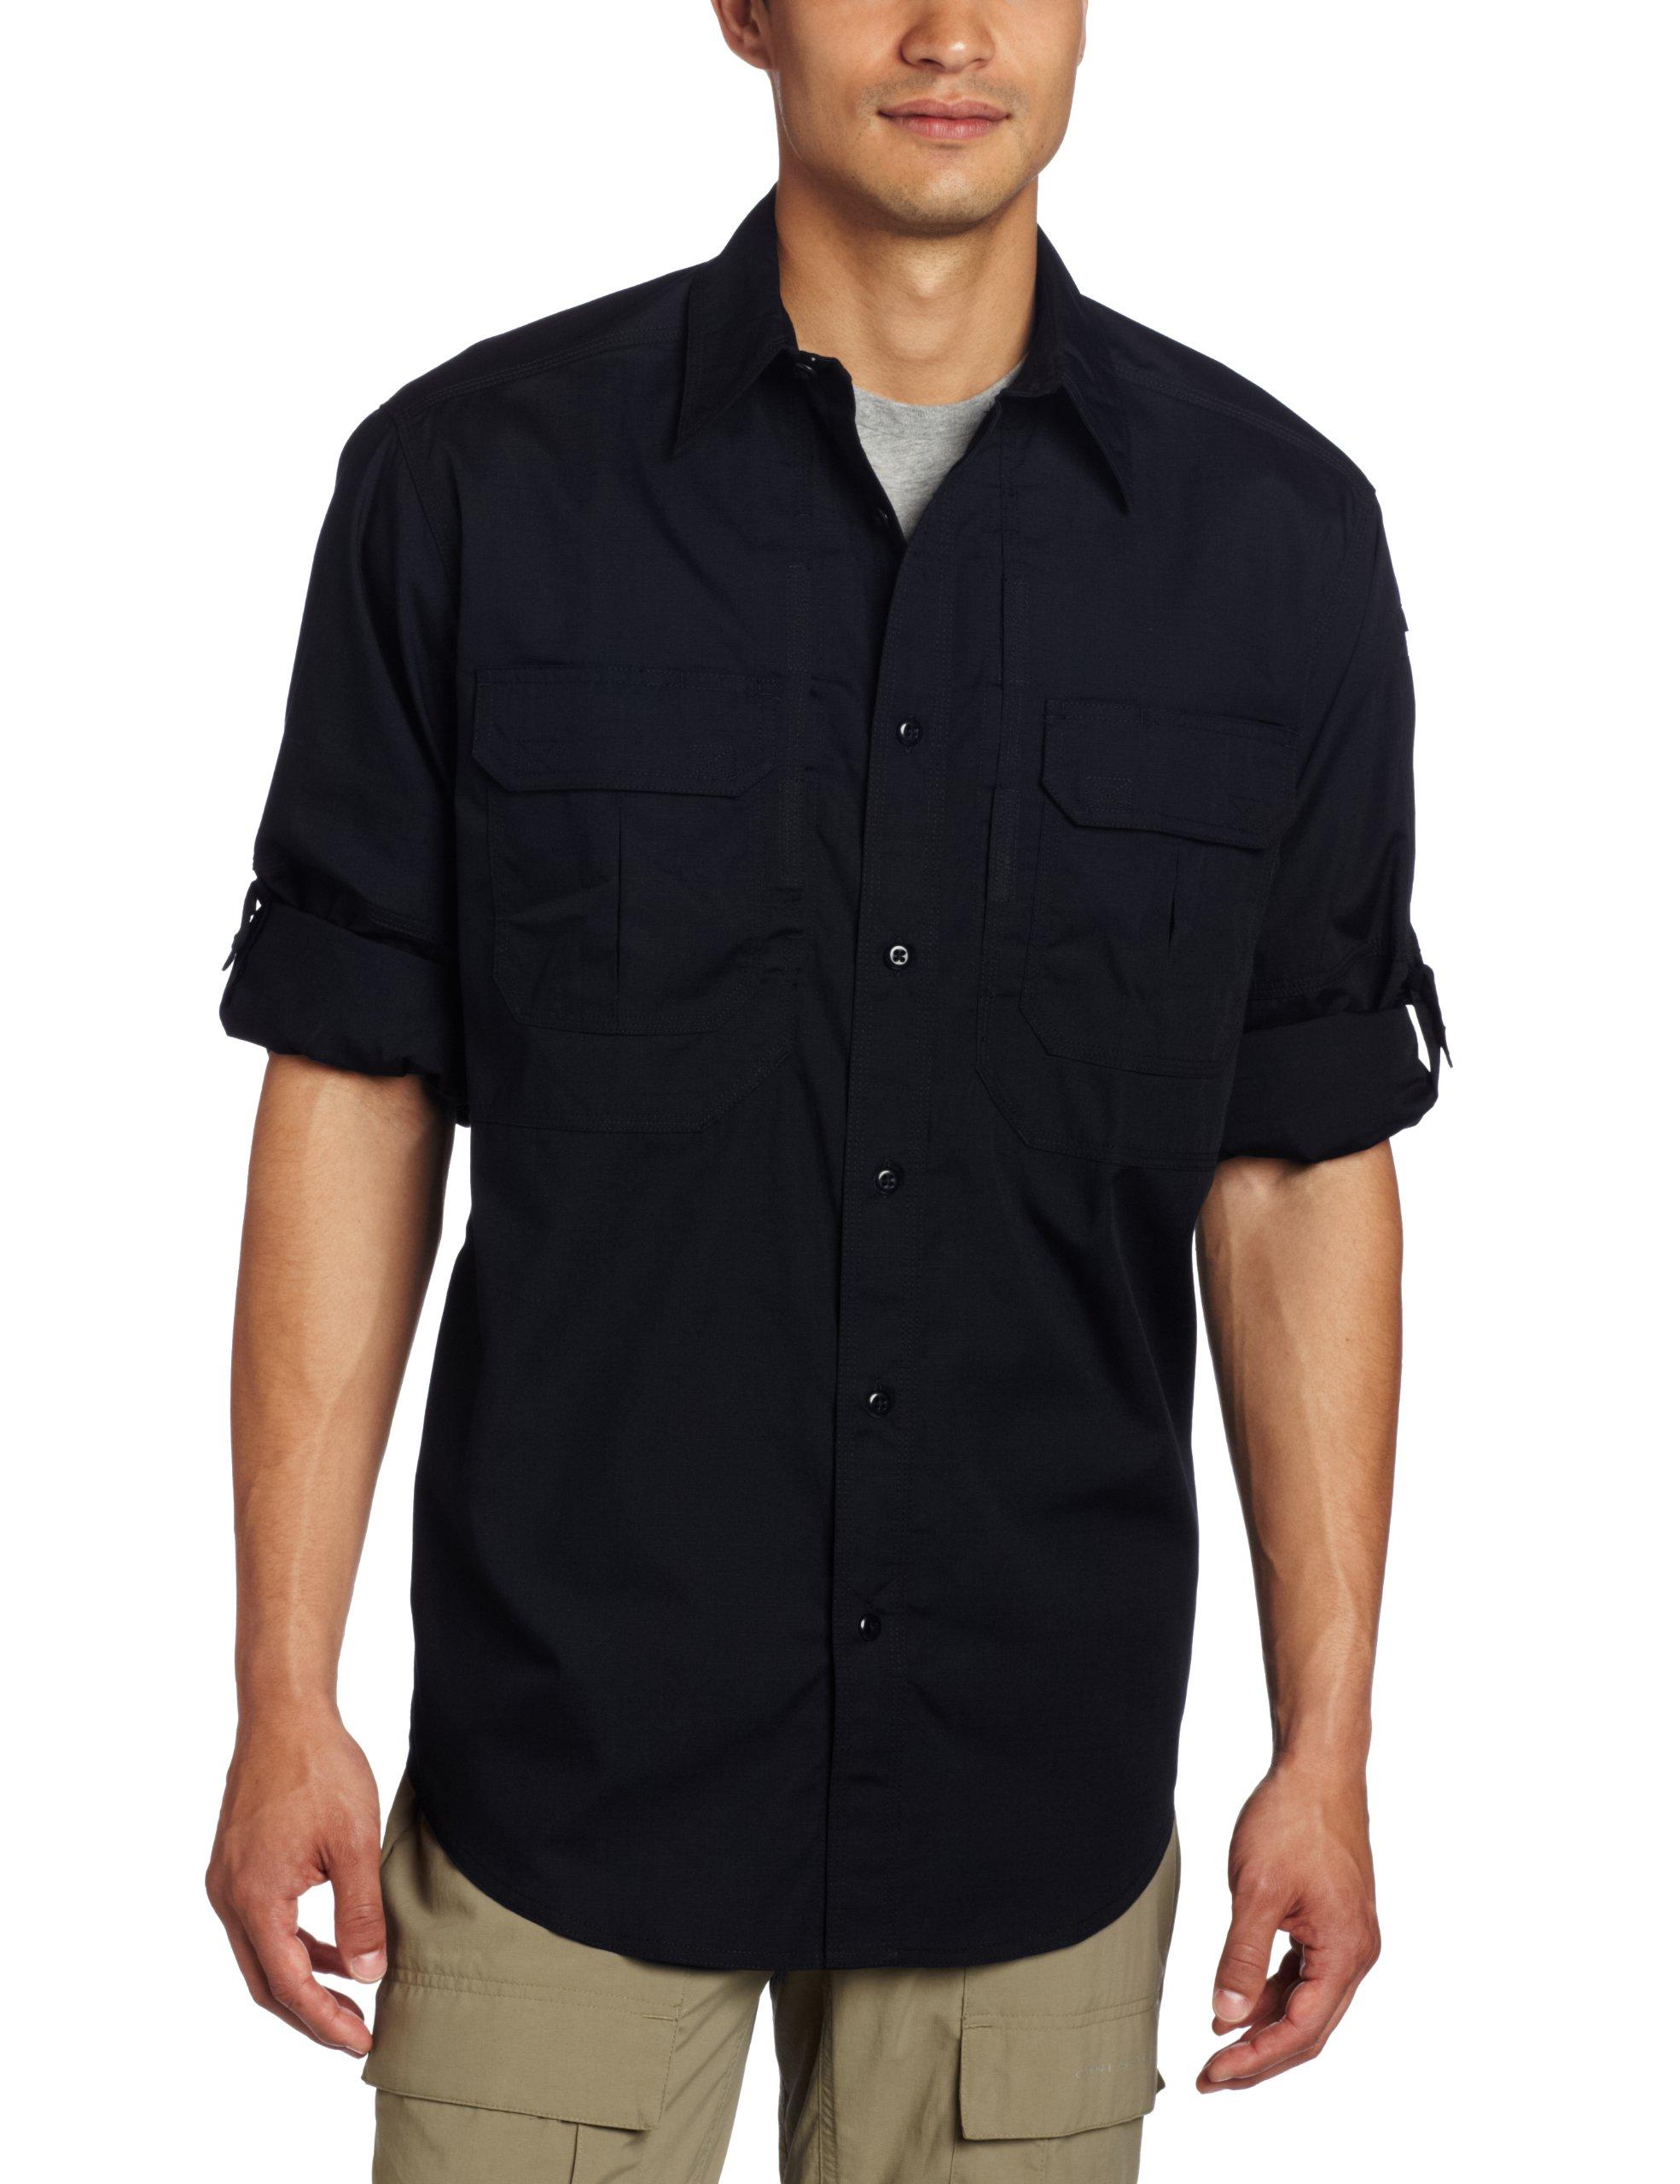 5.11 Tactical TacLite Professional Long Sleeve Shirt, Dark Navy, Medium